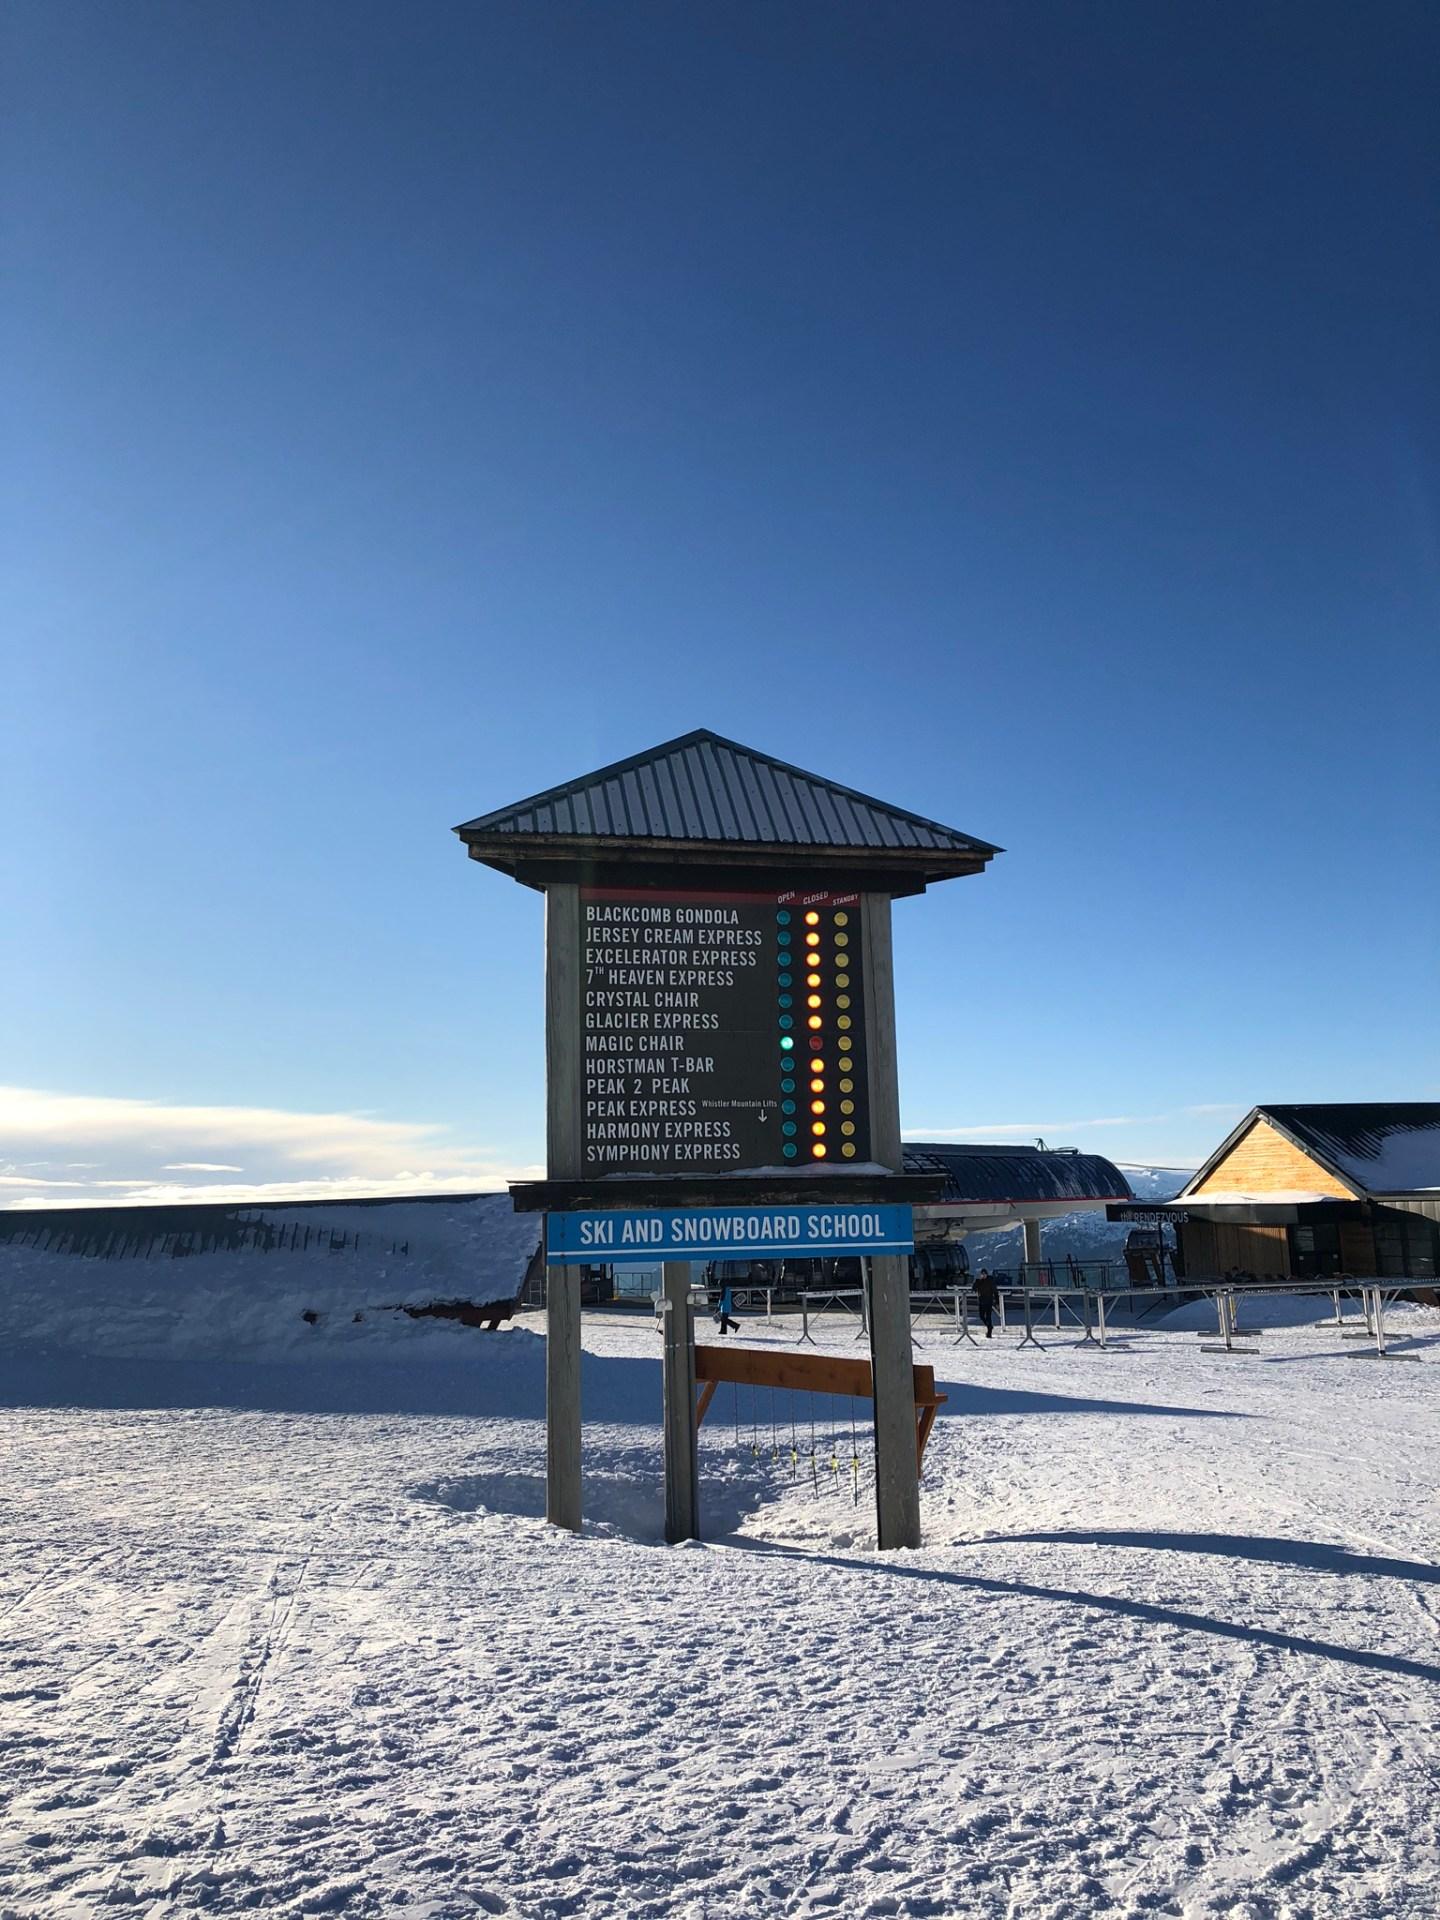 Ski and snowboard school, Blackcomb Mountain